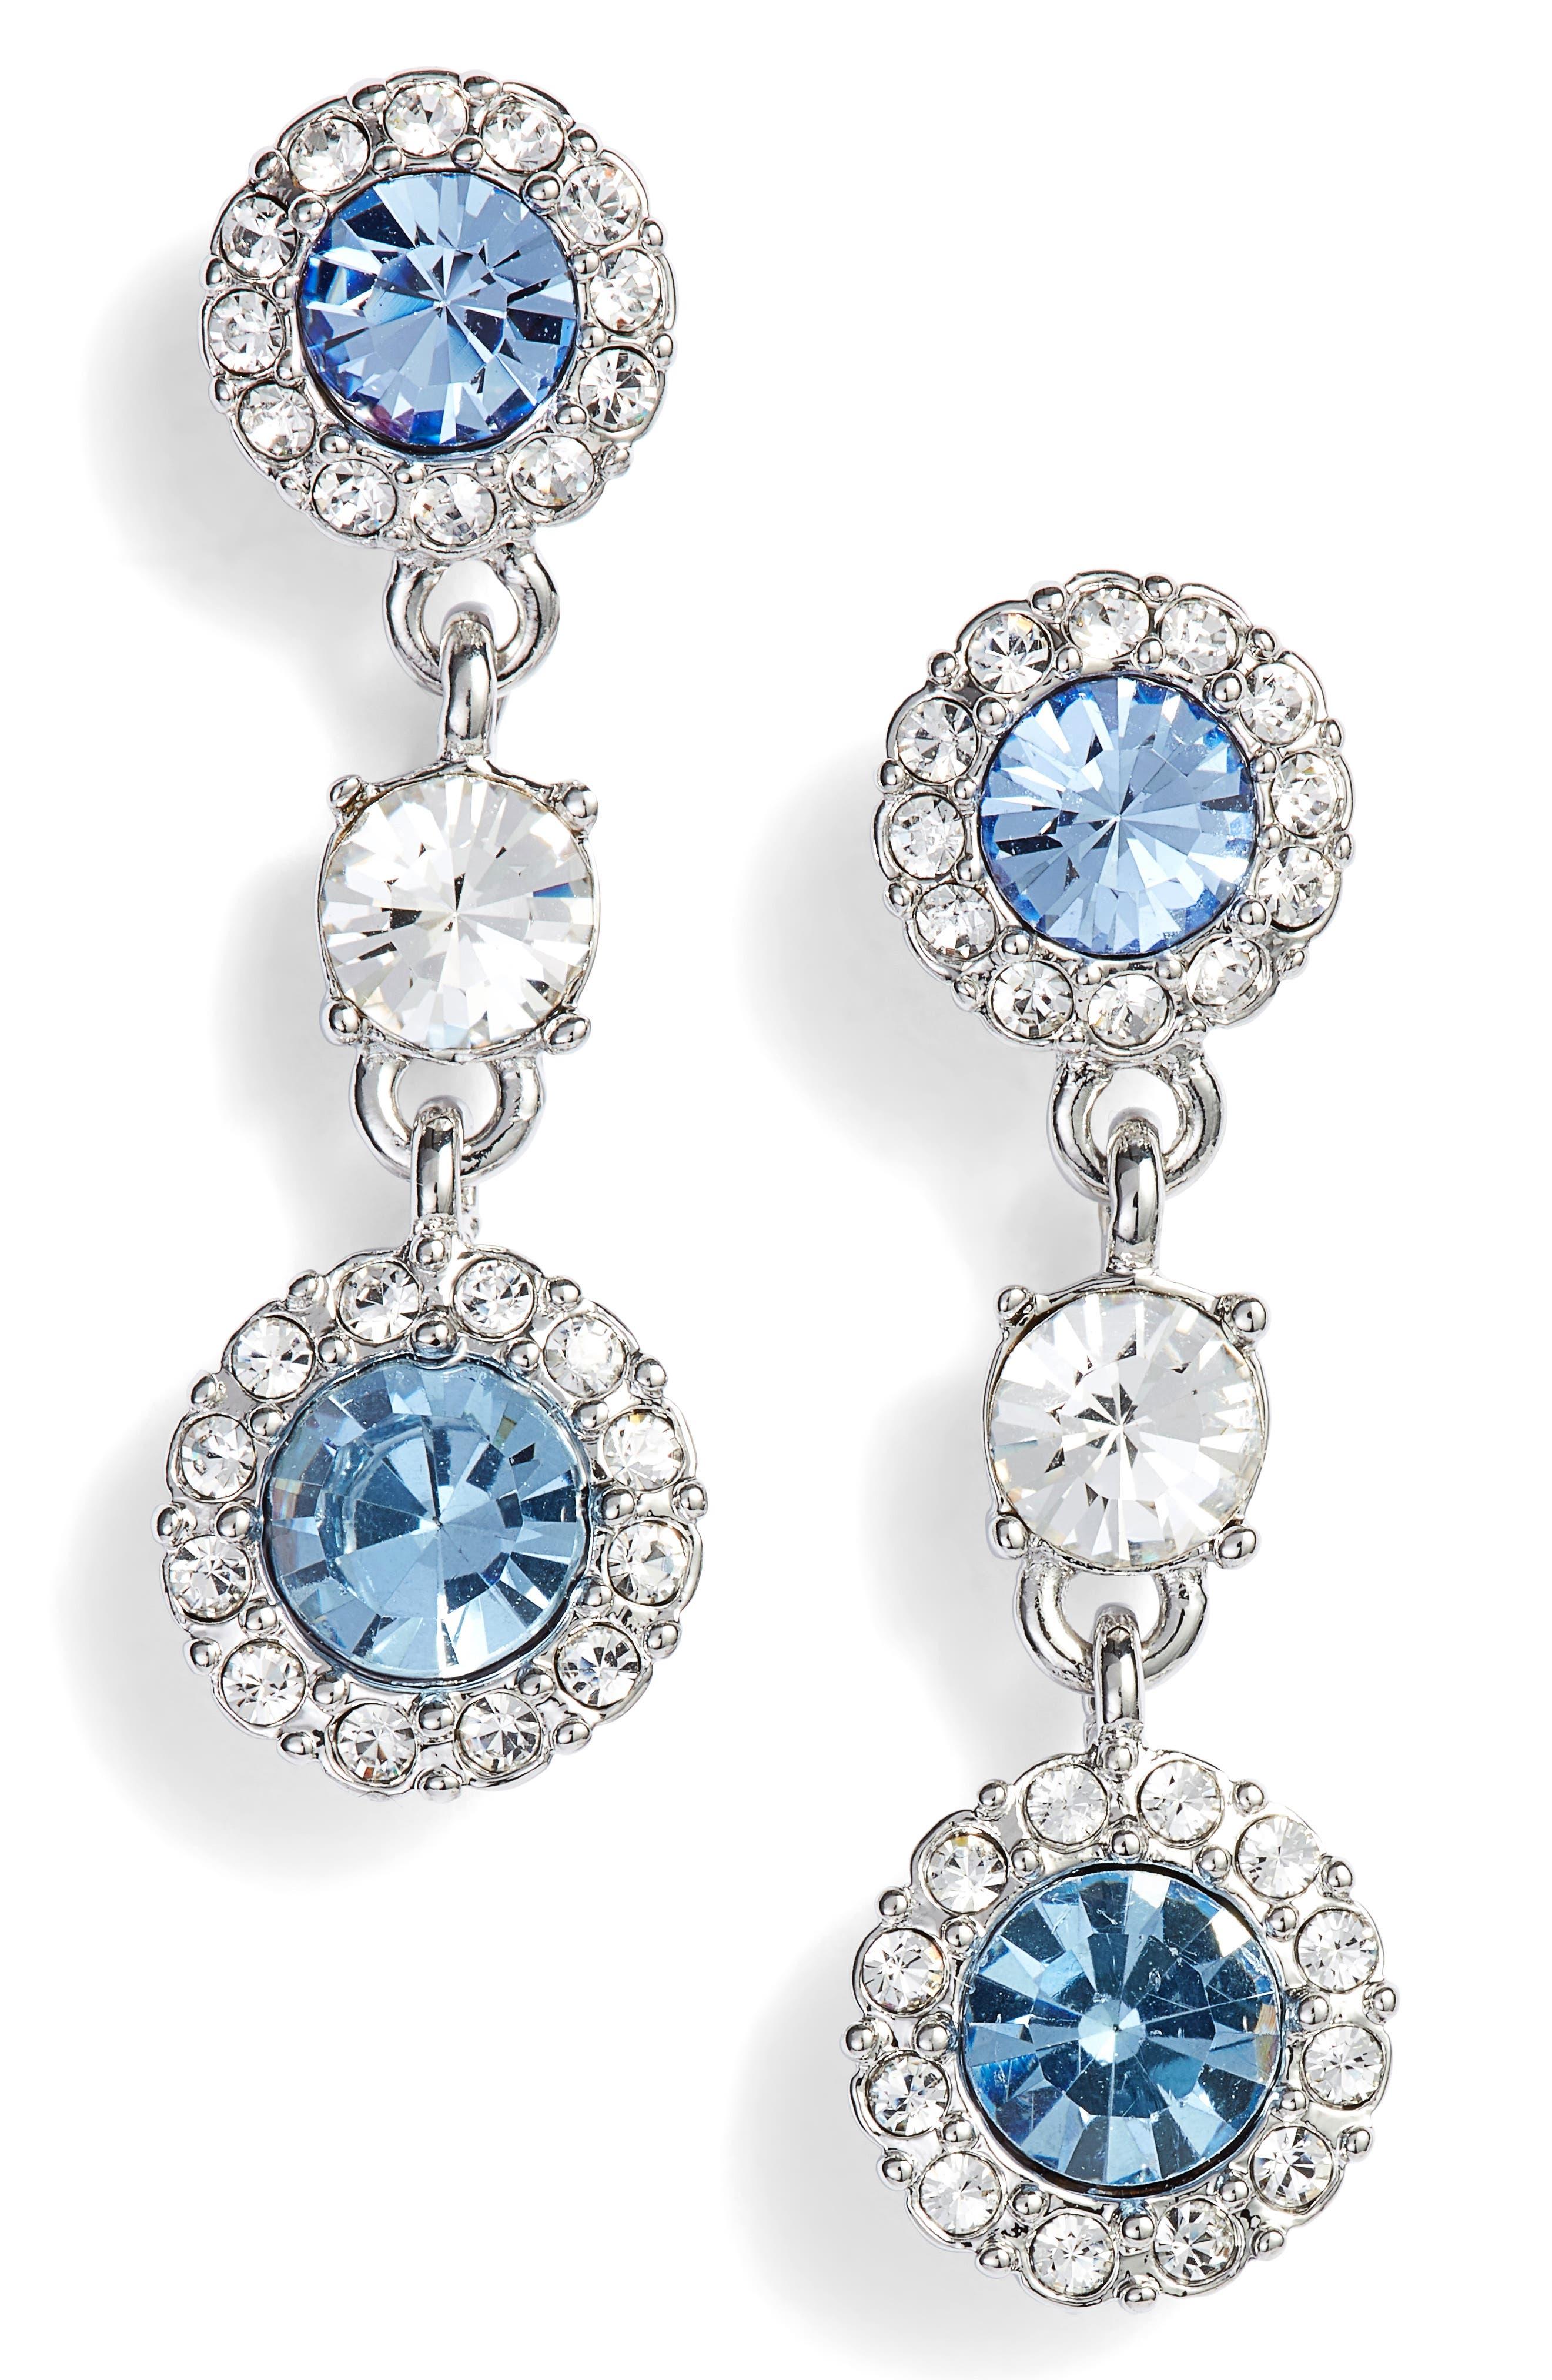 Swarovski Crystal Triple Drop Earrings,                         Main,                         color, SILVER/ SAPPHIRE/ CRYSTAL